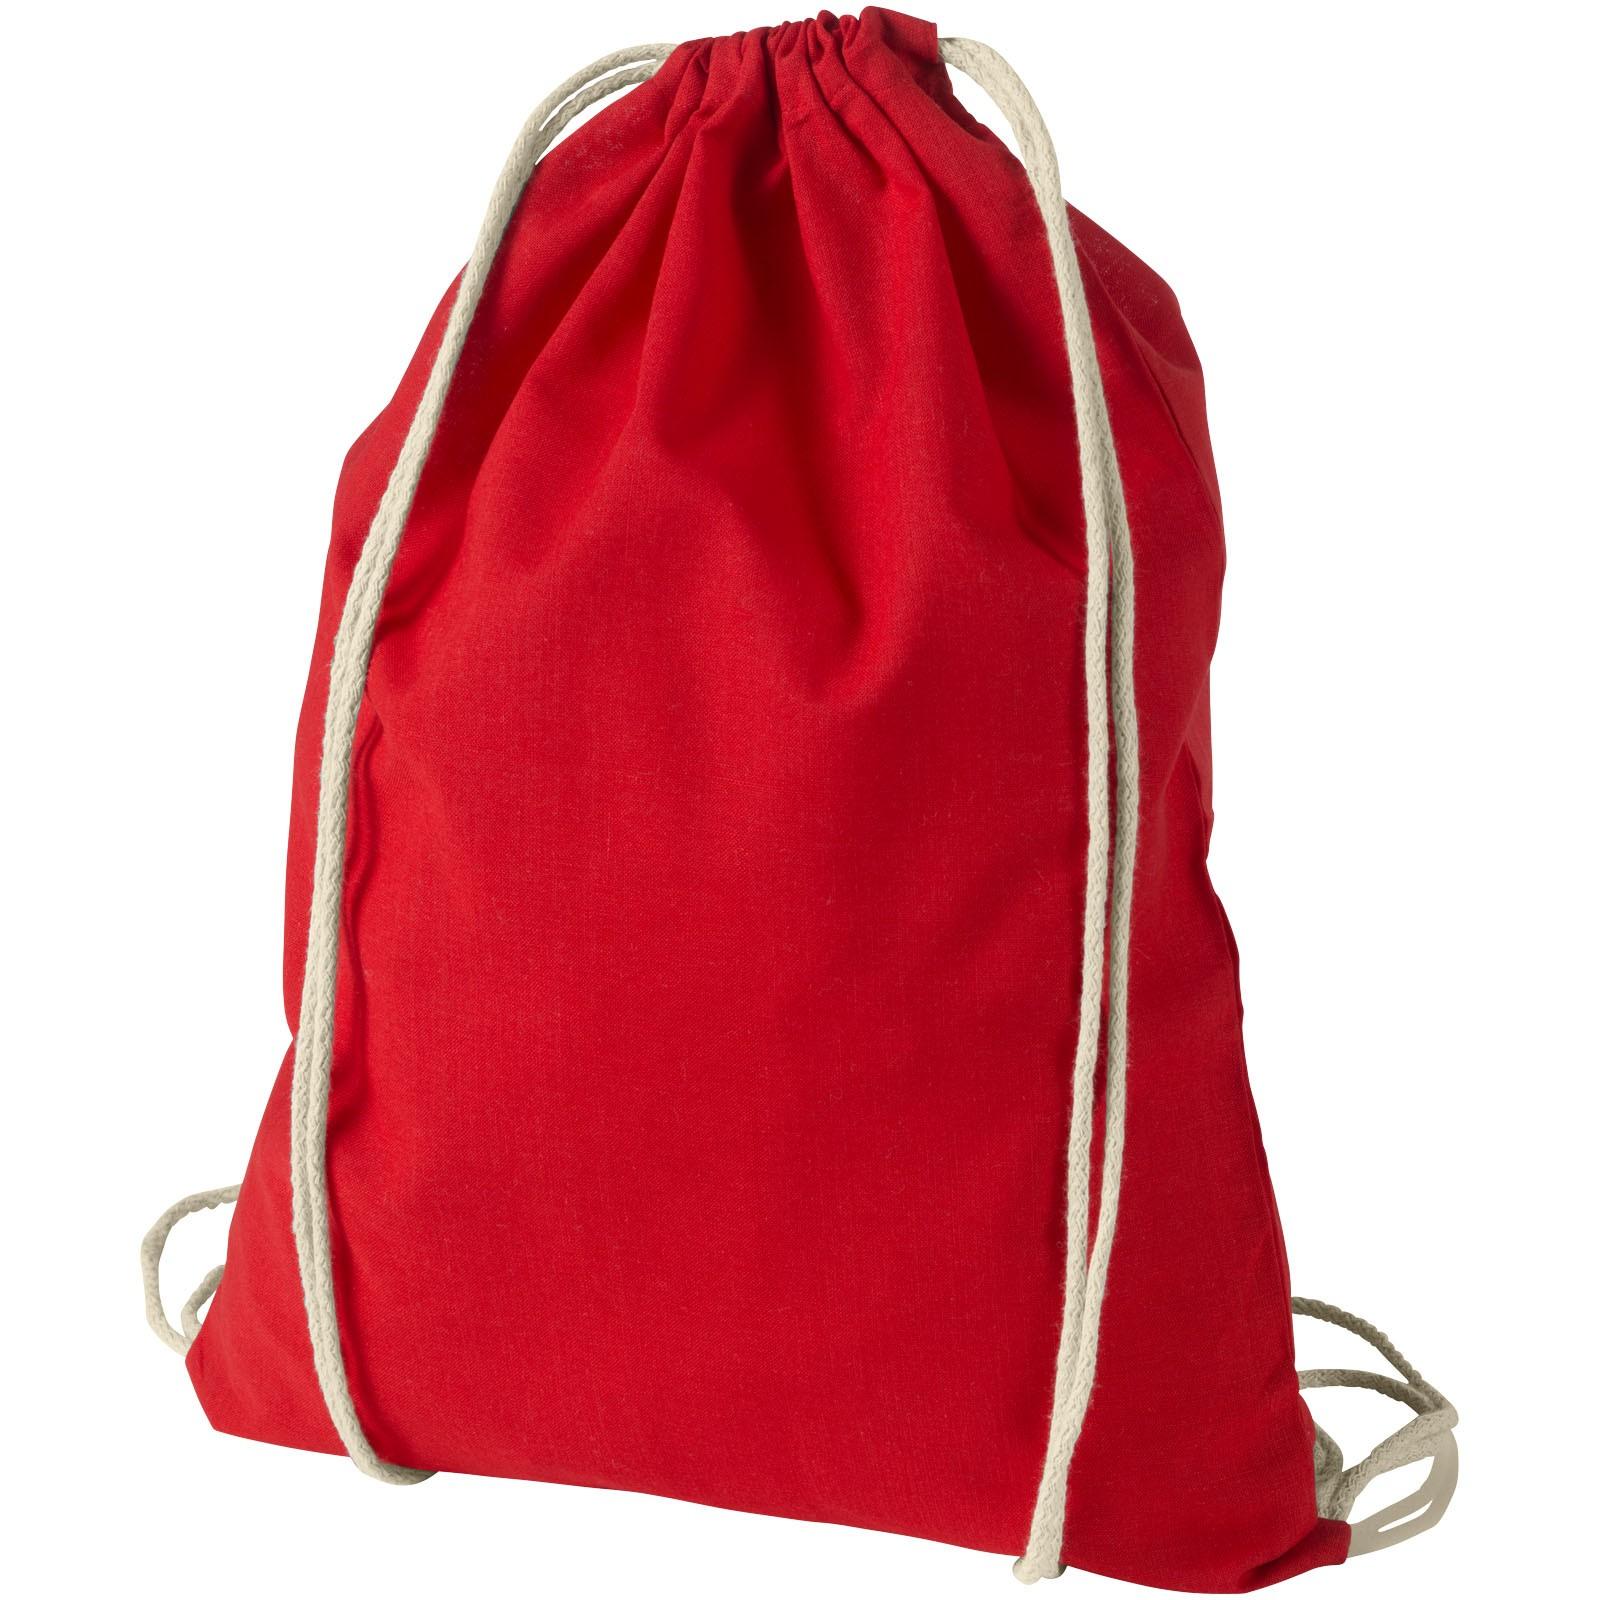 Oregon 100 g/m² cotton drawstring backpack - Red